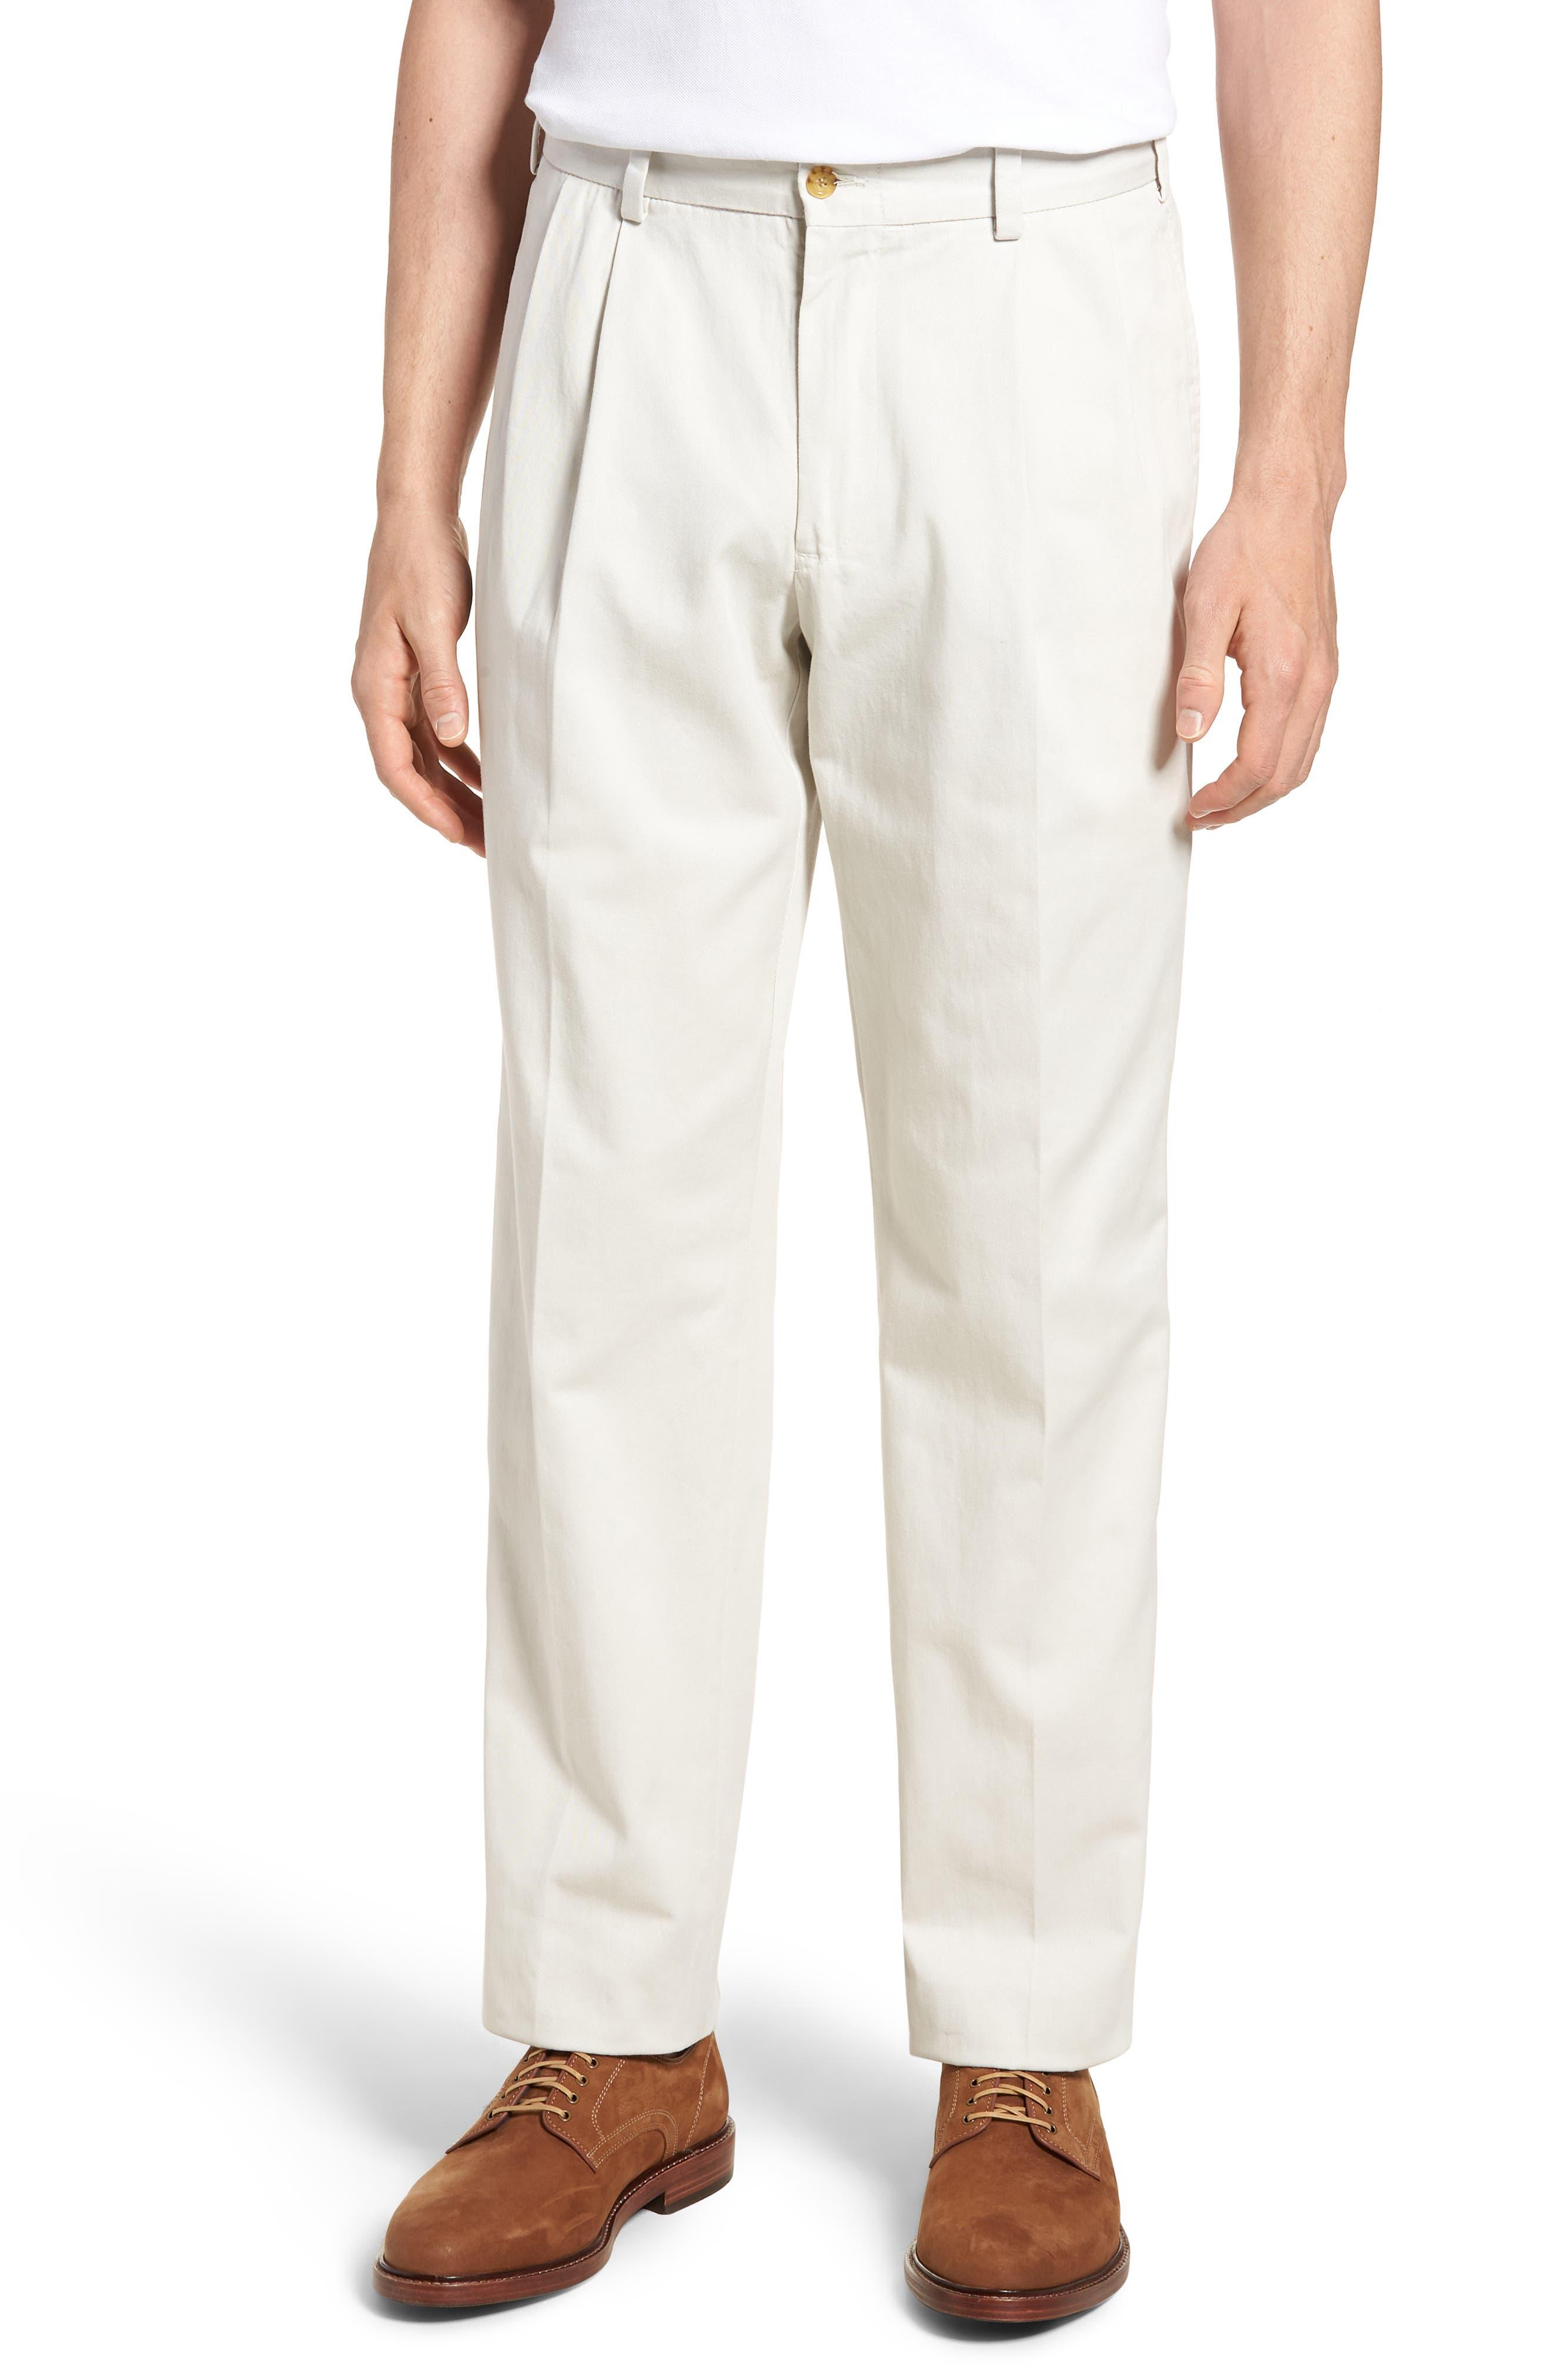 Bills Khakis M2 Classic Fit Vintage Twill Pleated Pants